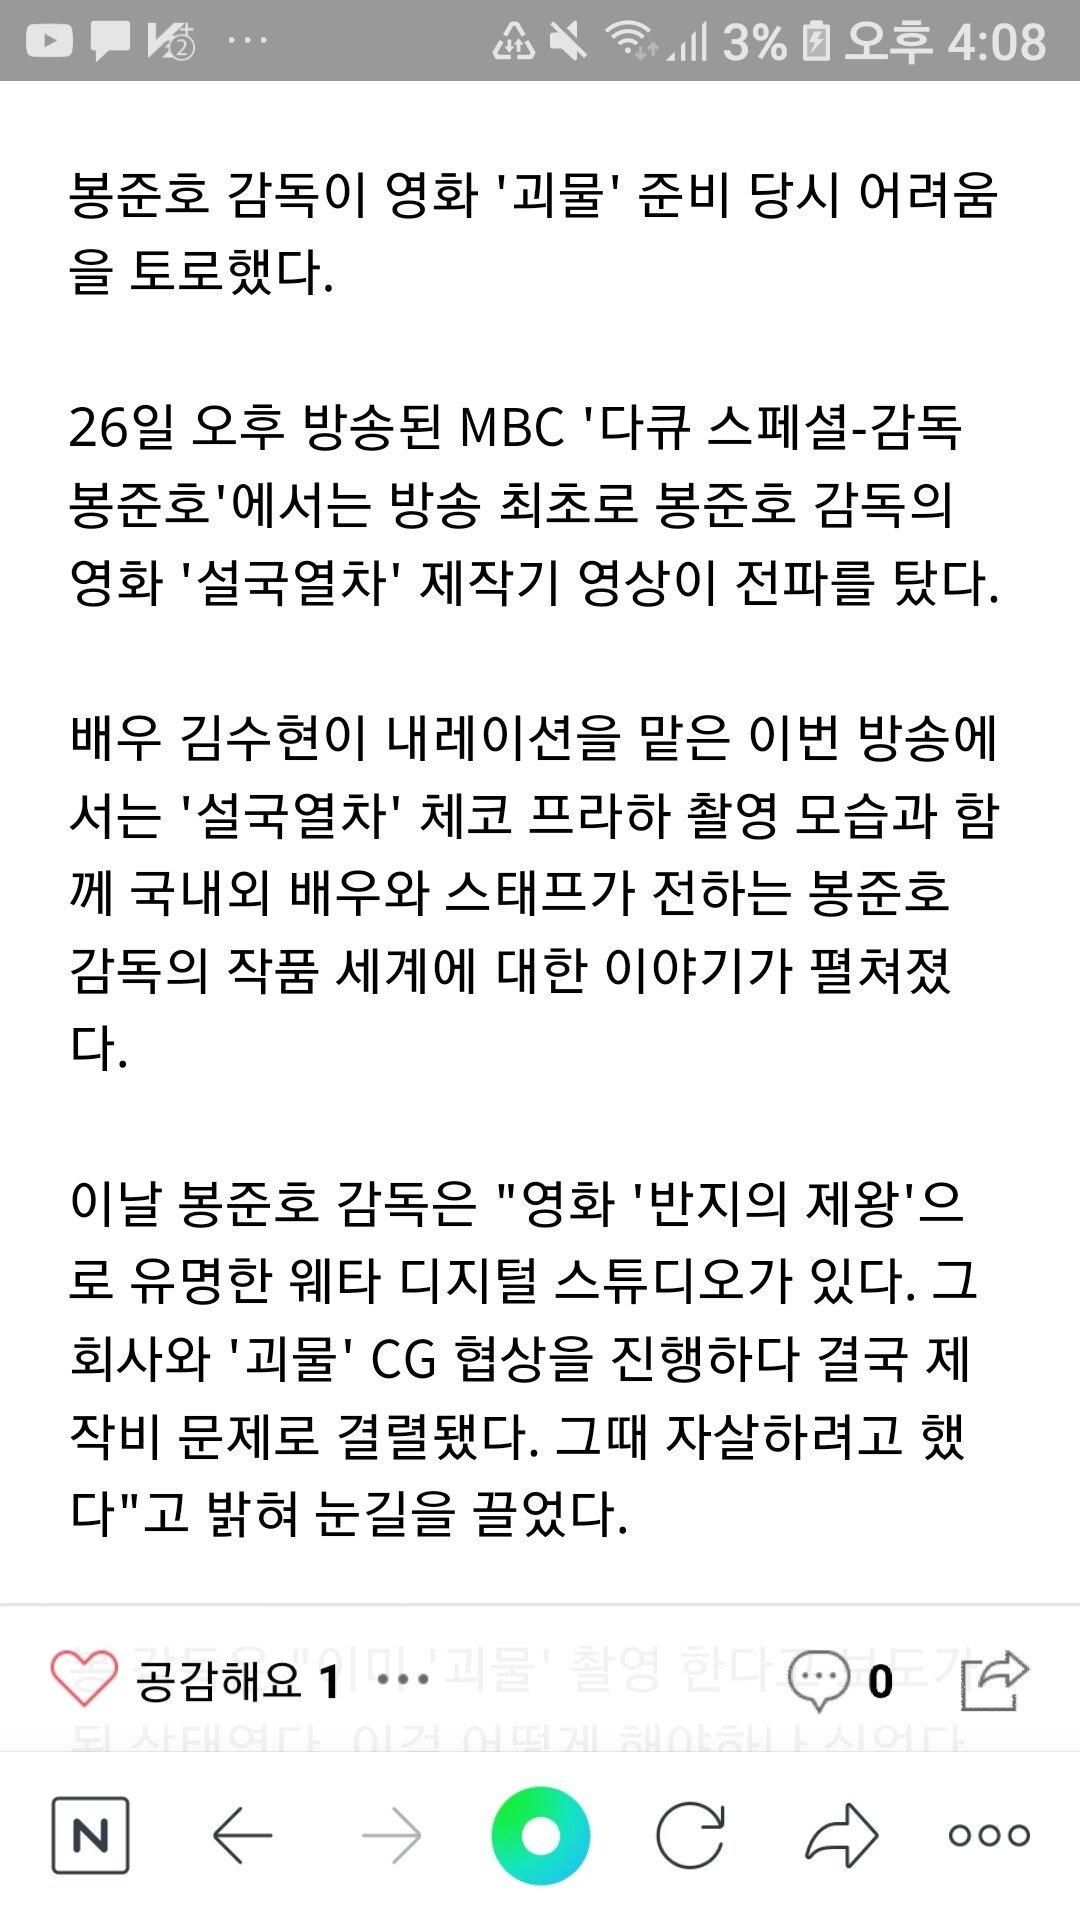 Screenshot_20190527-160802_NAVER.jpg 봉준호감독이 자살을 생각했던 이유